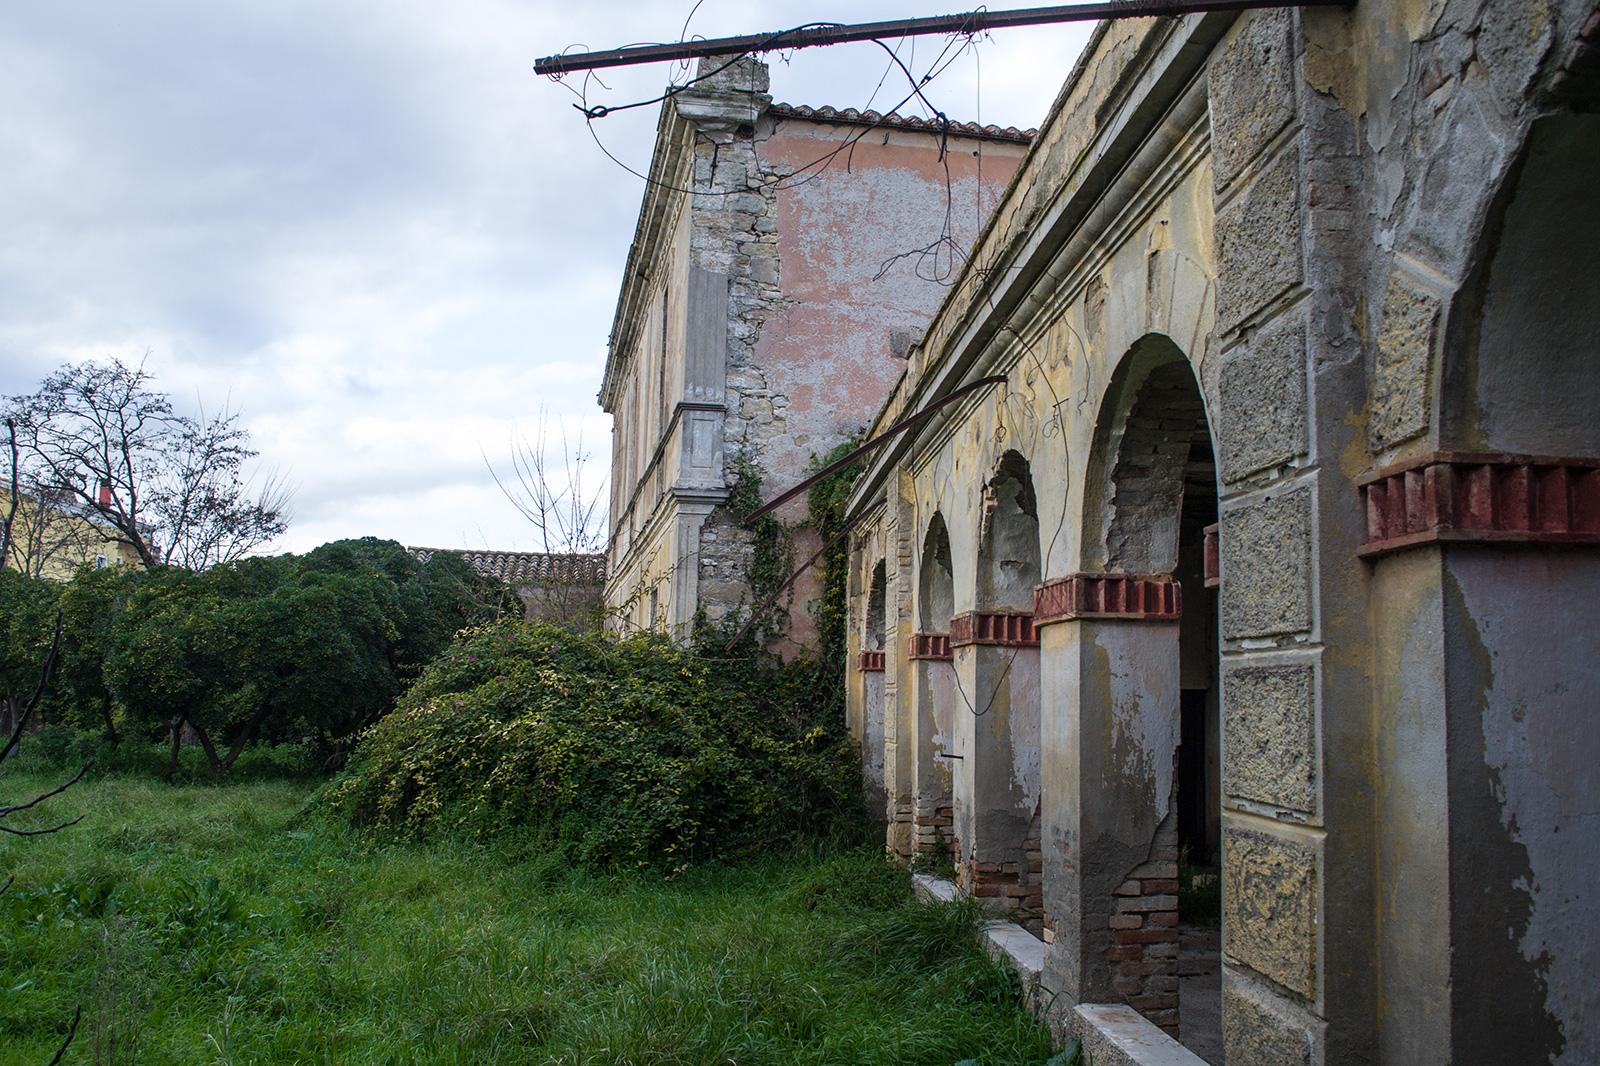 Casa santa cruz villanovafranca sardegna abbandonata - Casa santa cruz ...